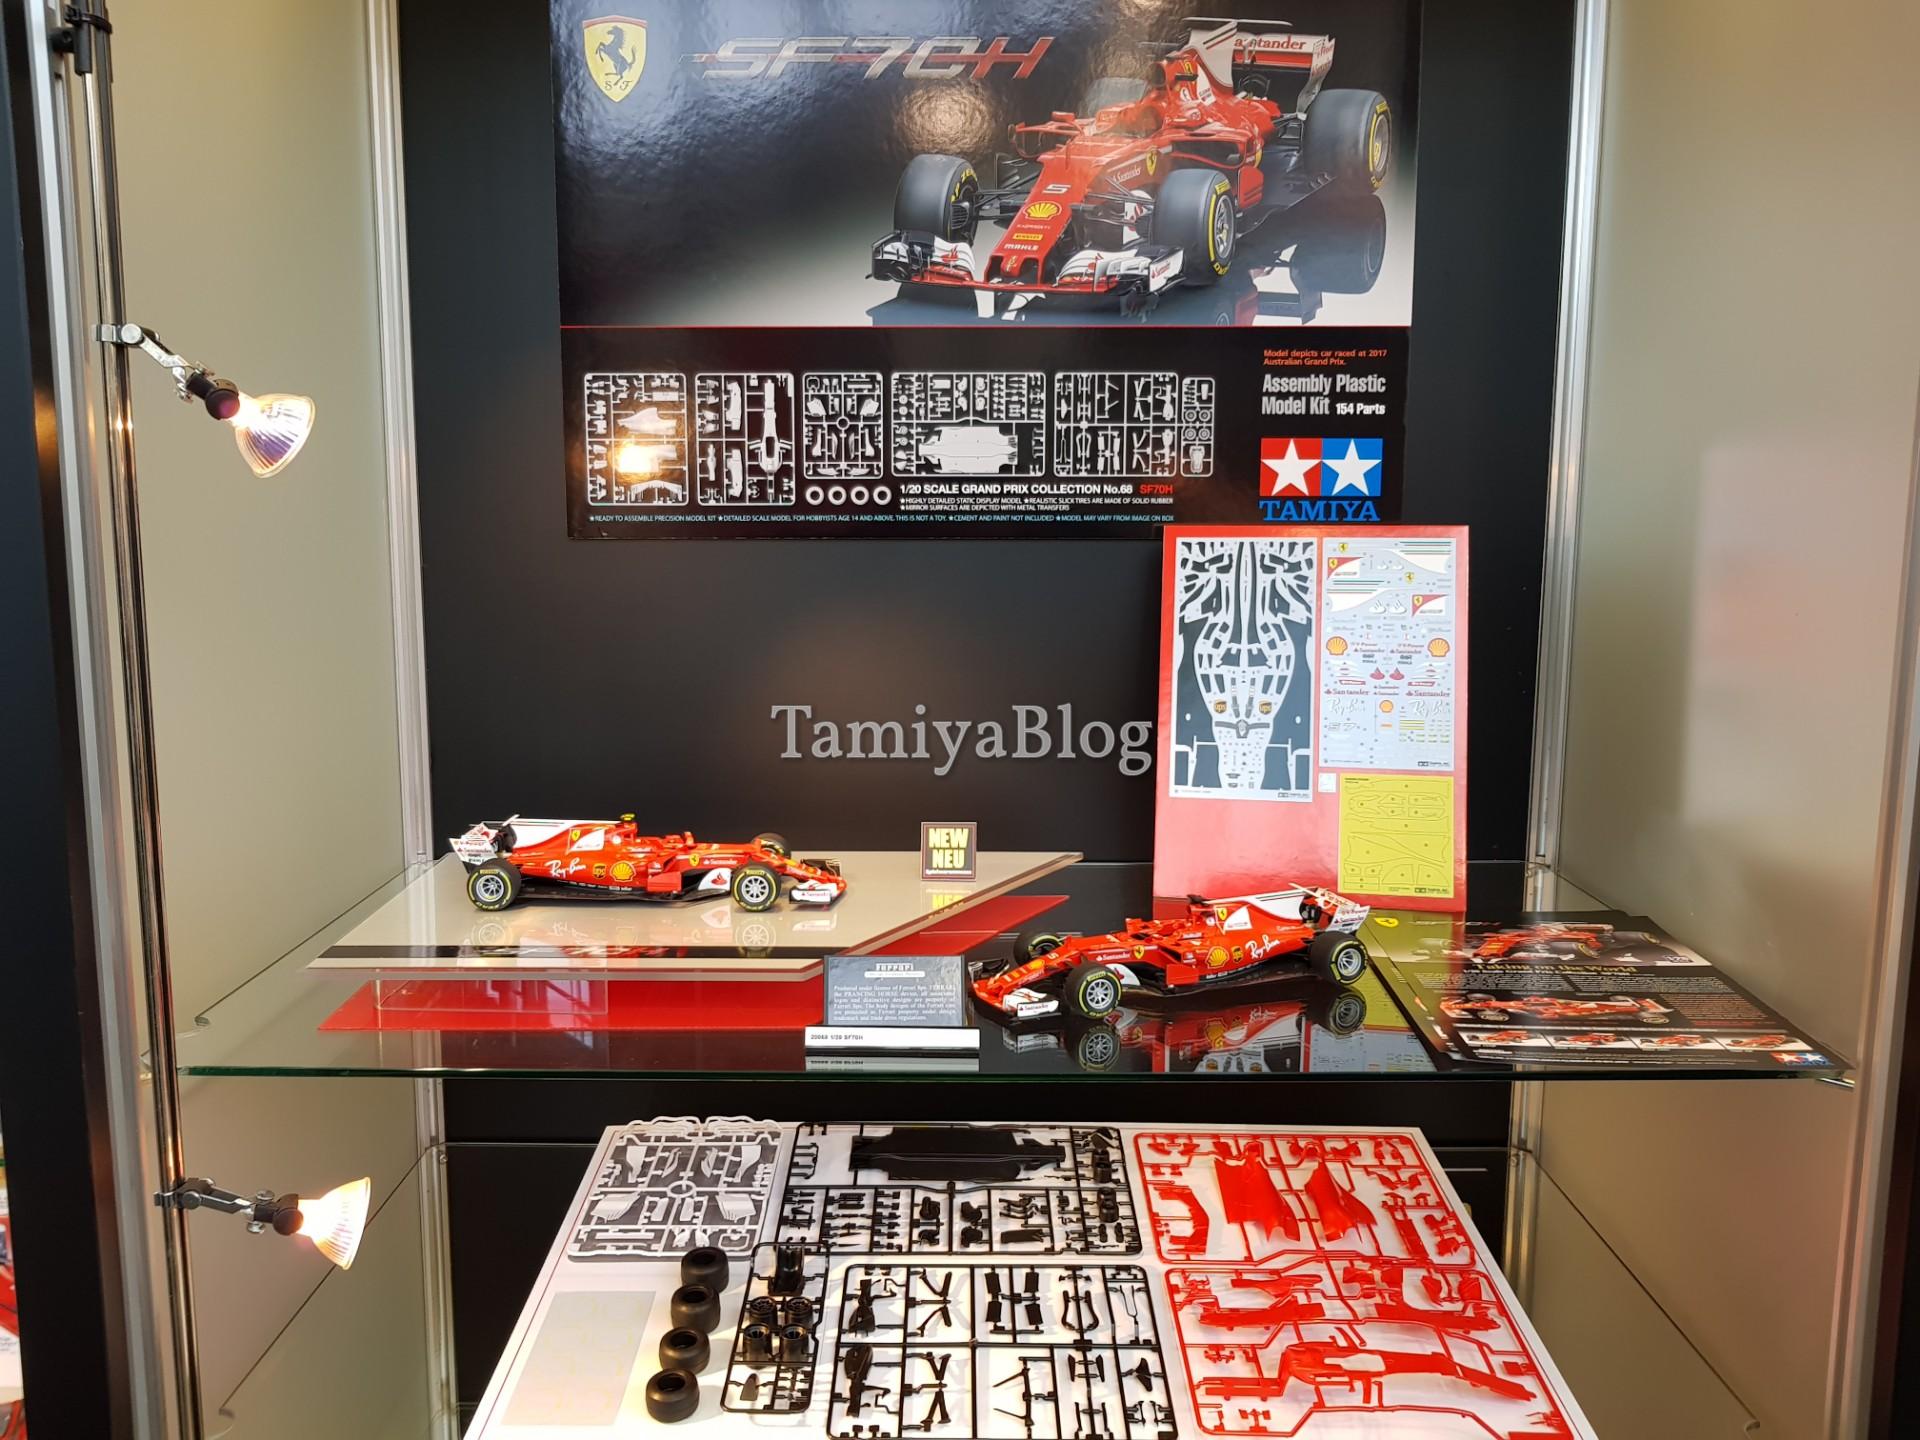 Tamiya 20068 1/20 FERRARI SF70H @ Nuremberg Toy Fair 2018